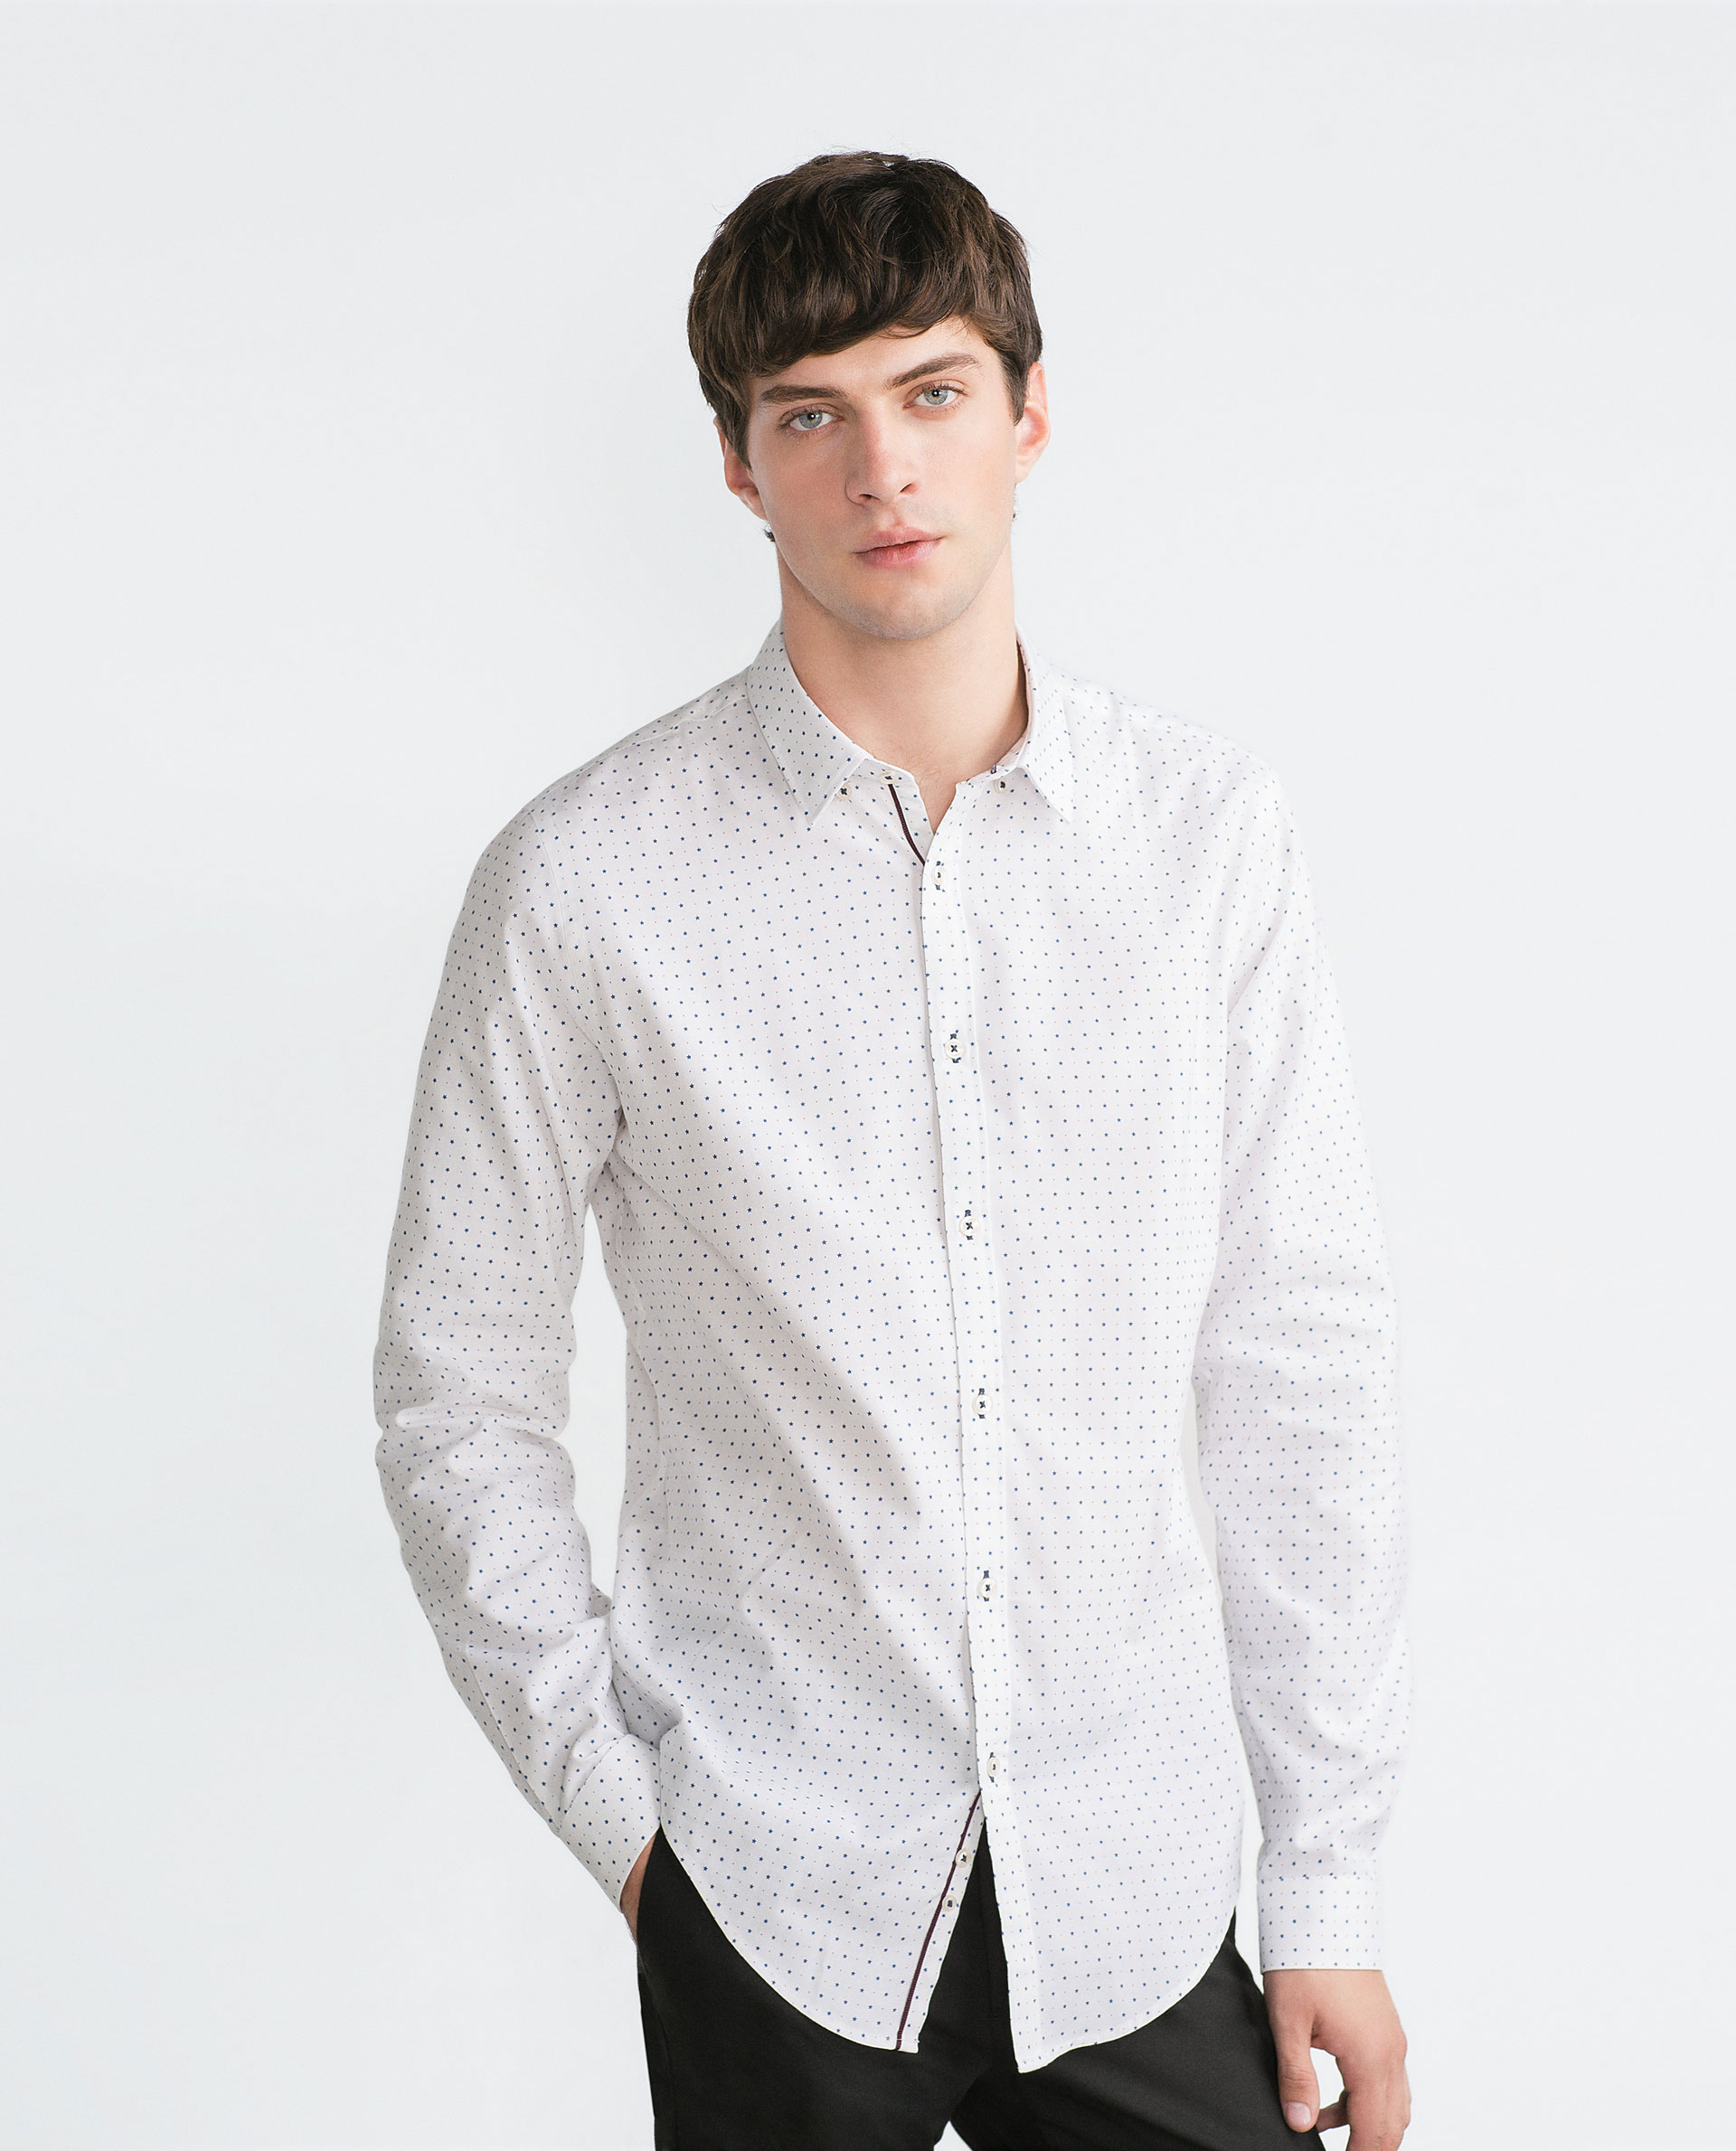 2016 camisa para hombre de seda verdadera de alto grado de